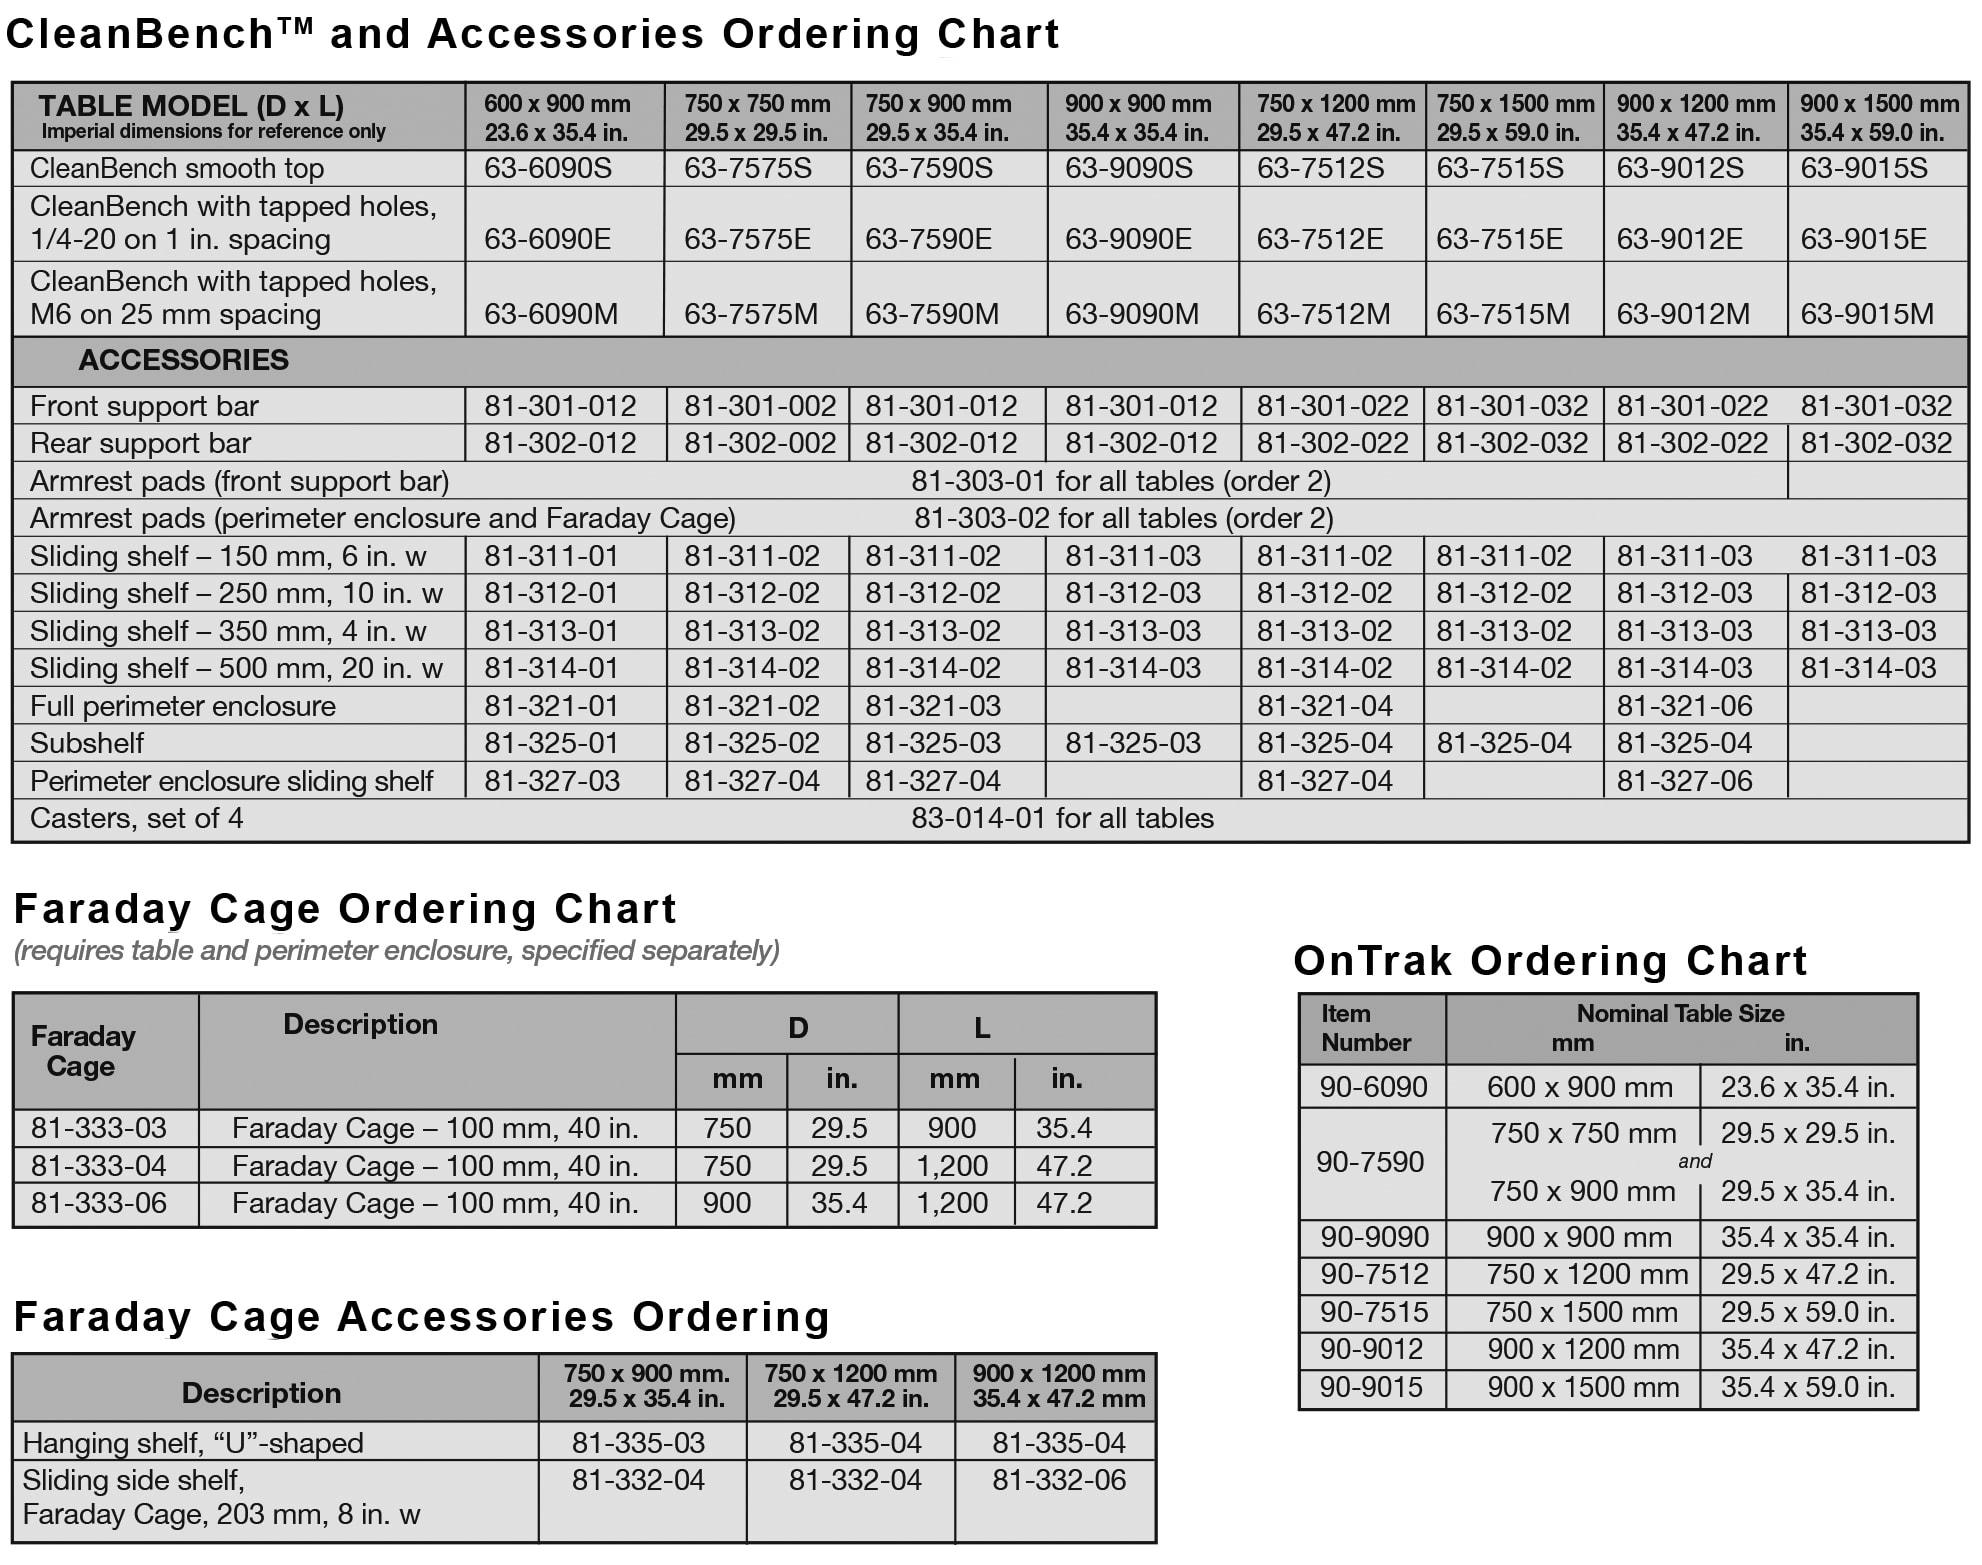 Ordering Chart